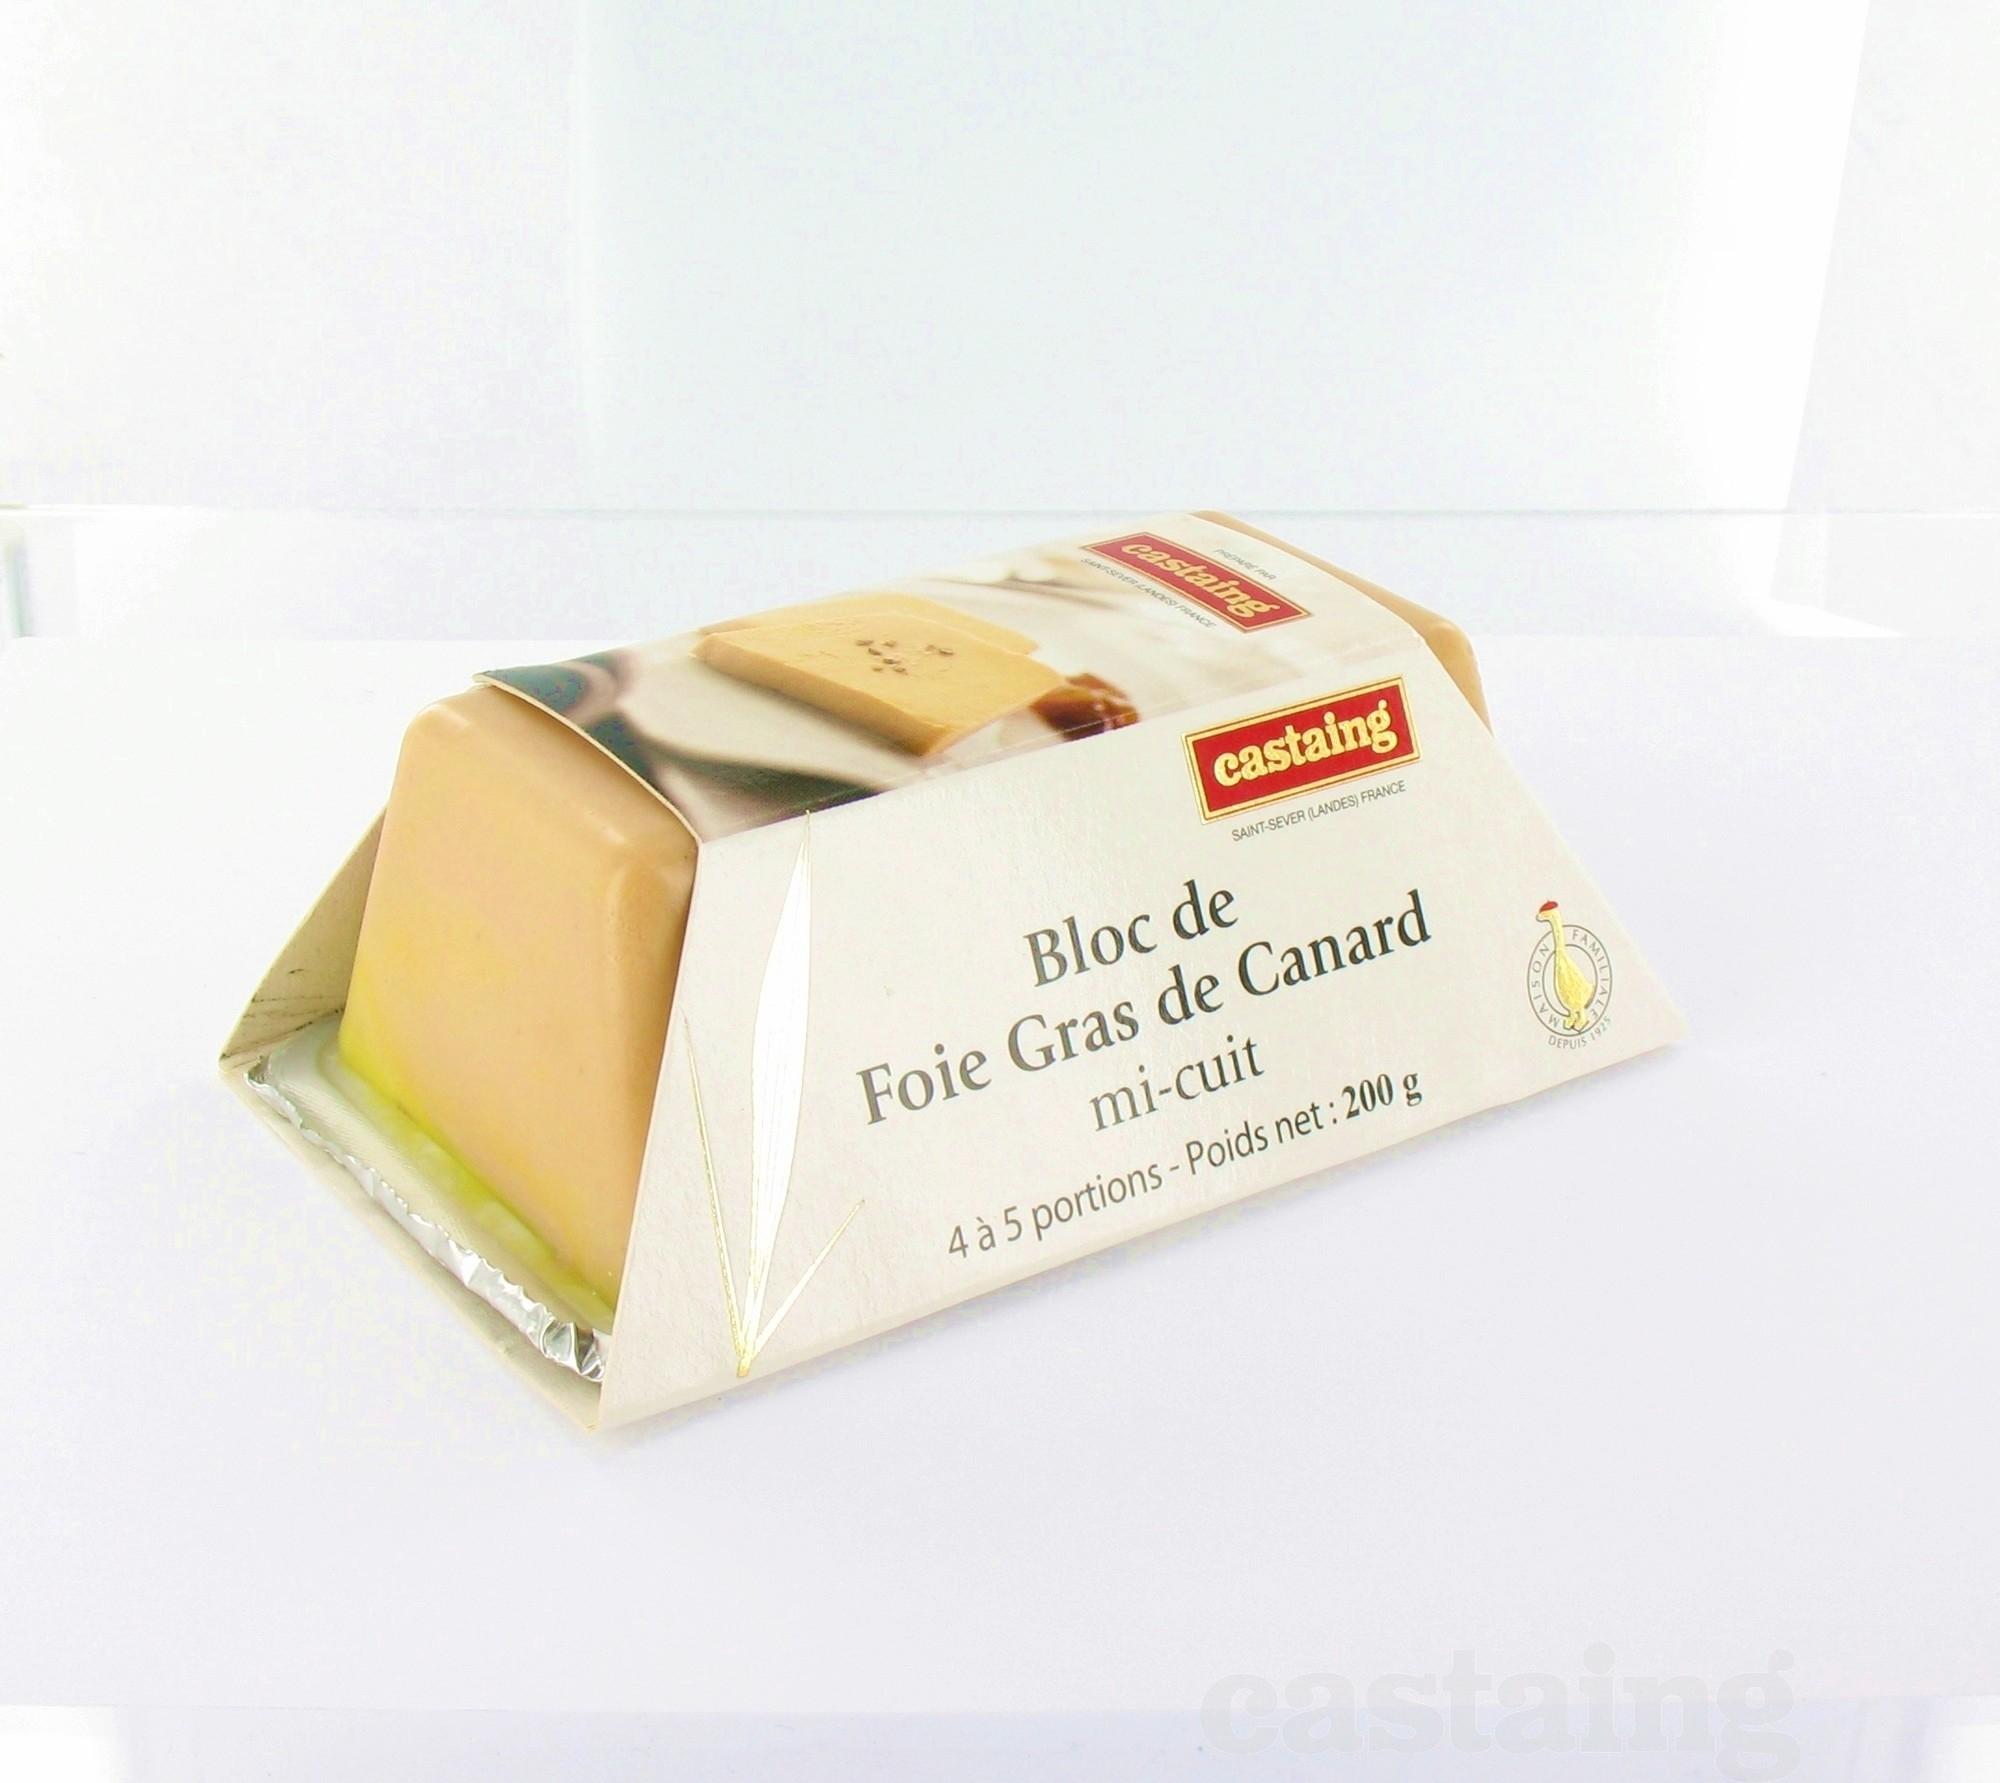 castaing bloc de foie gras de canard mi cuit